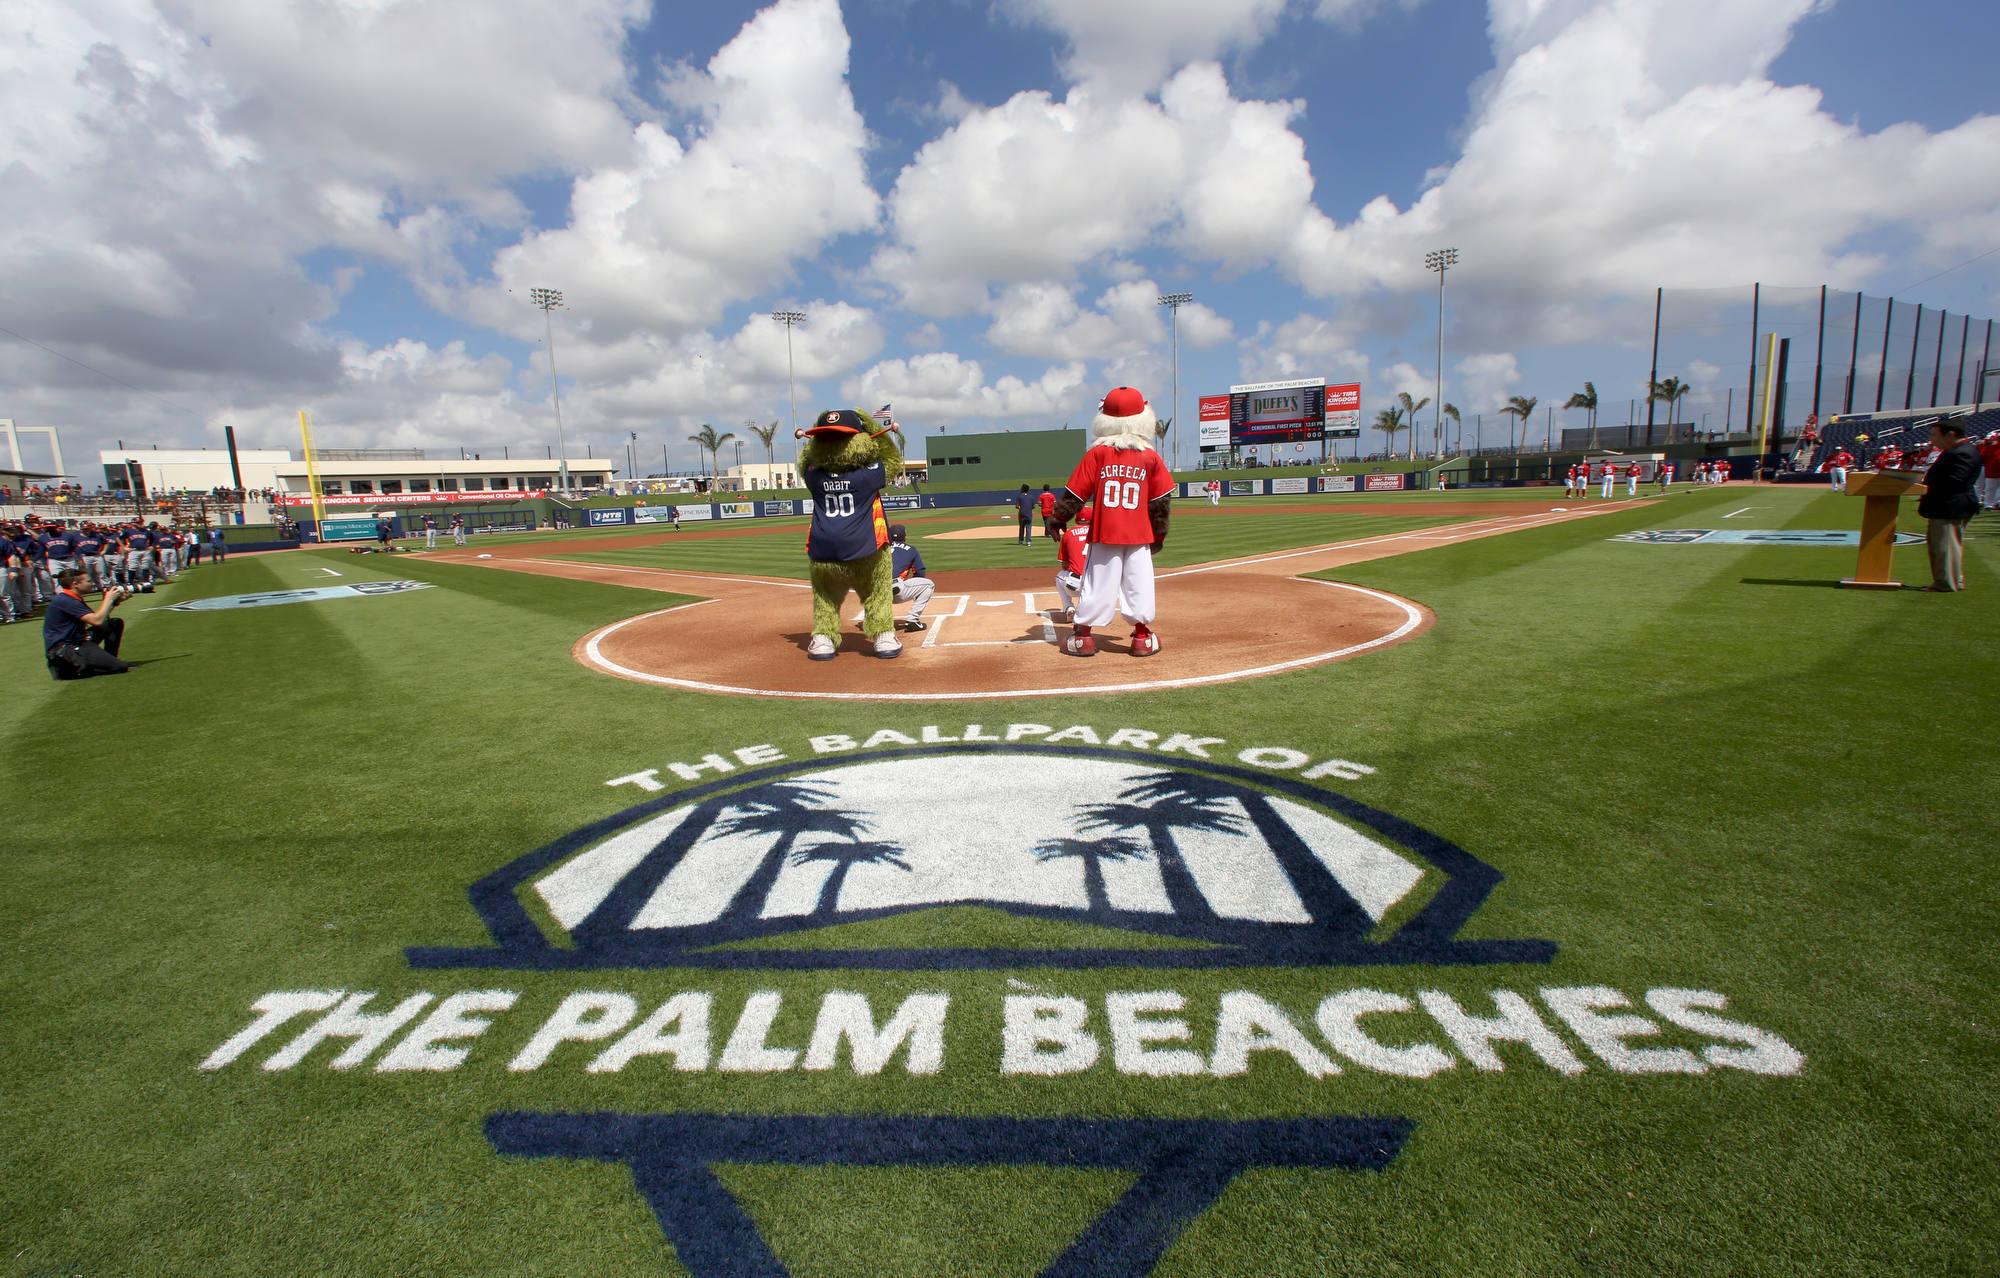 Fl-sp-ballpark-palm-beaches-opener-0301